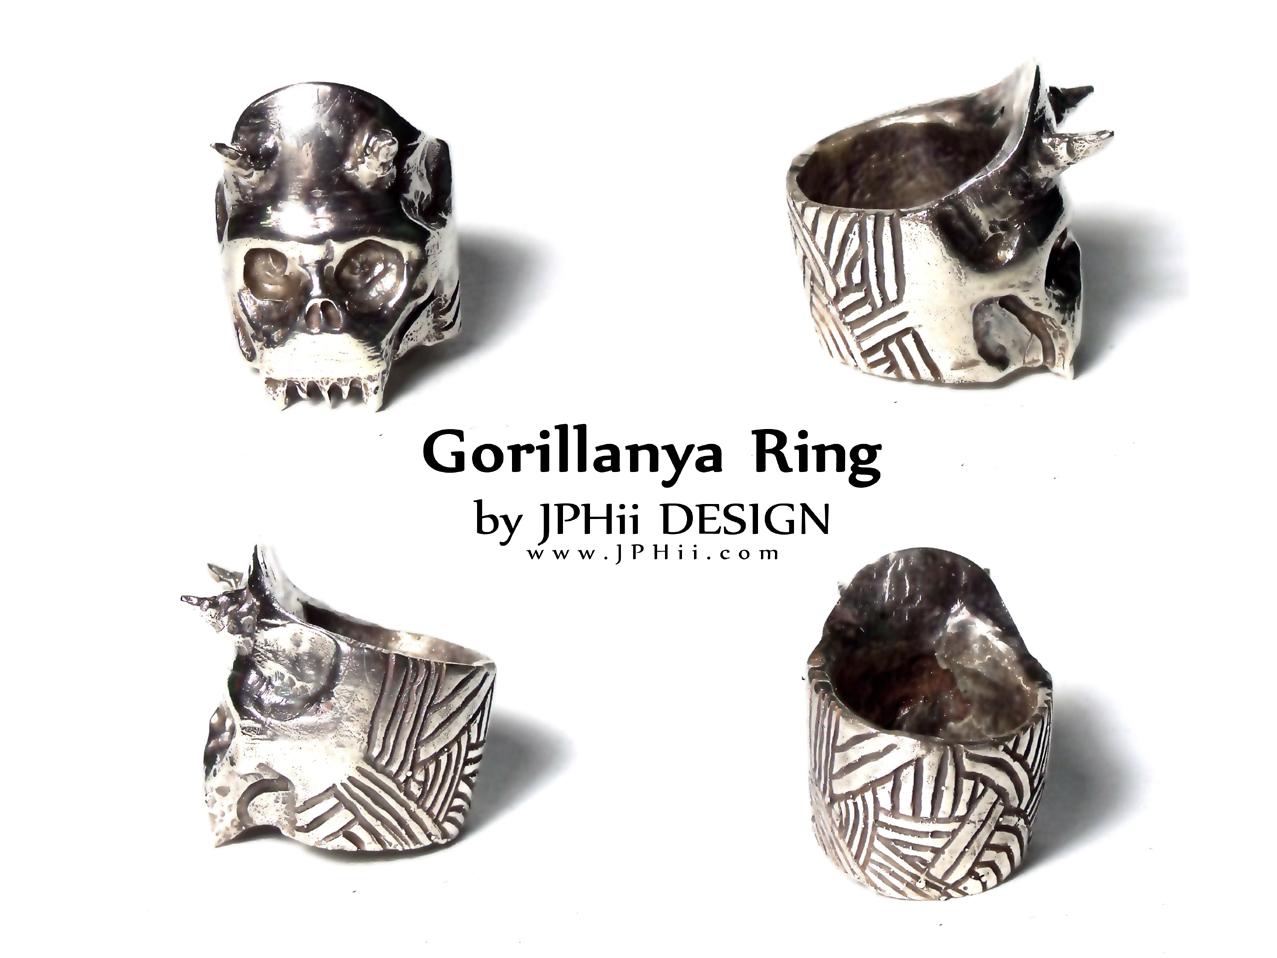 Goriliyana Ring